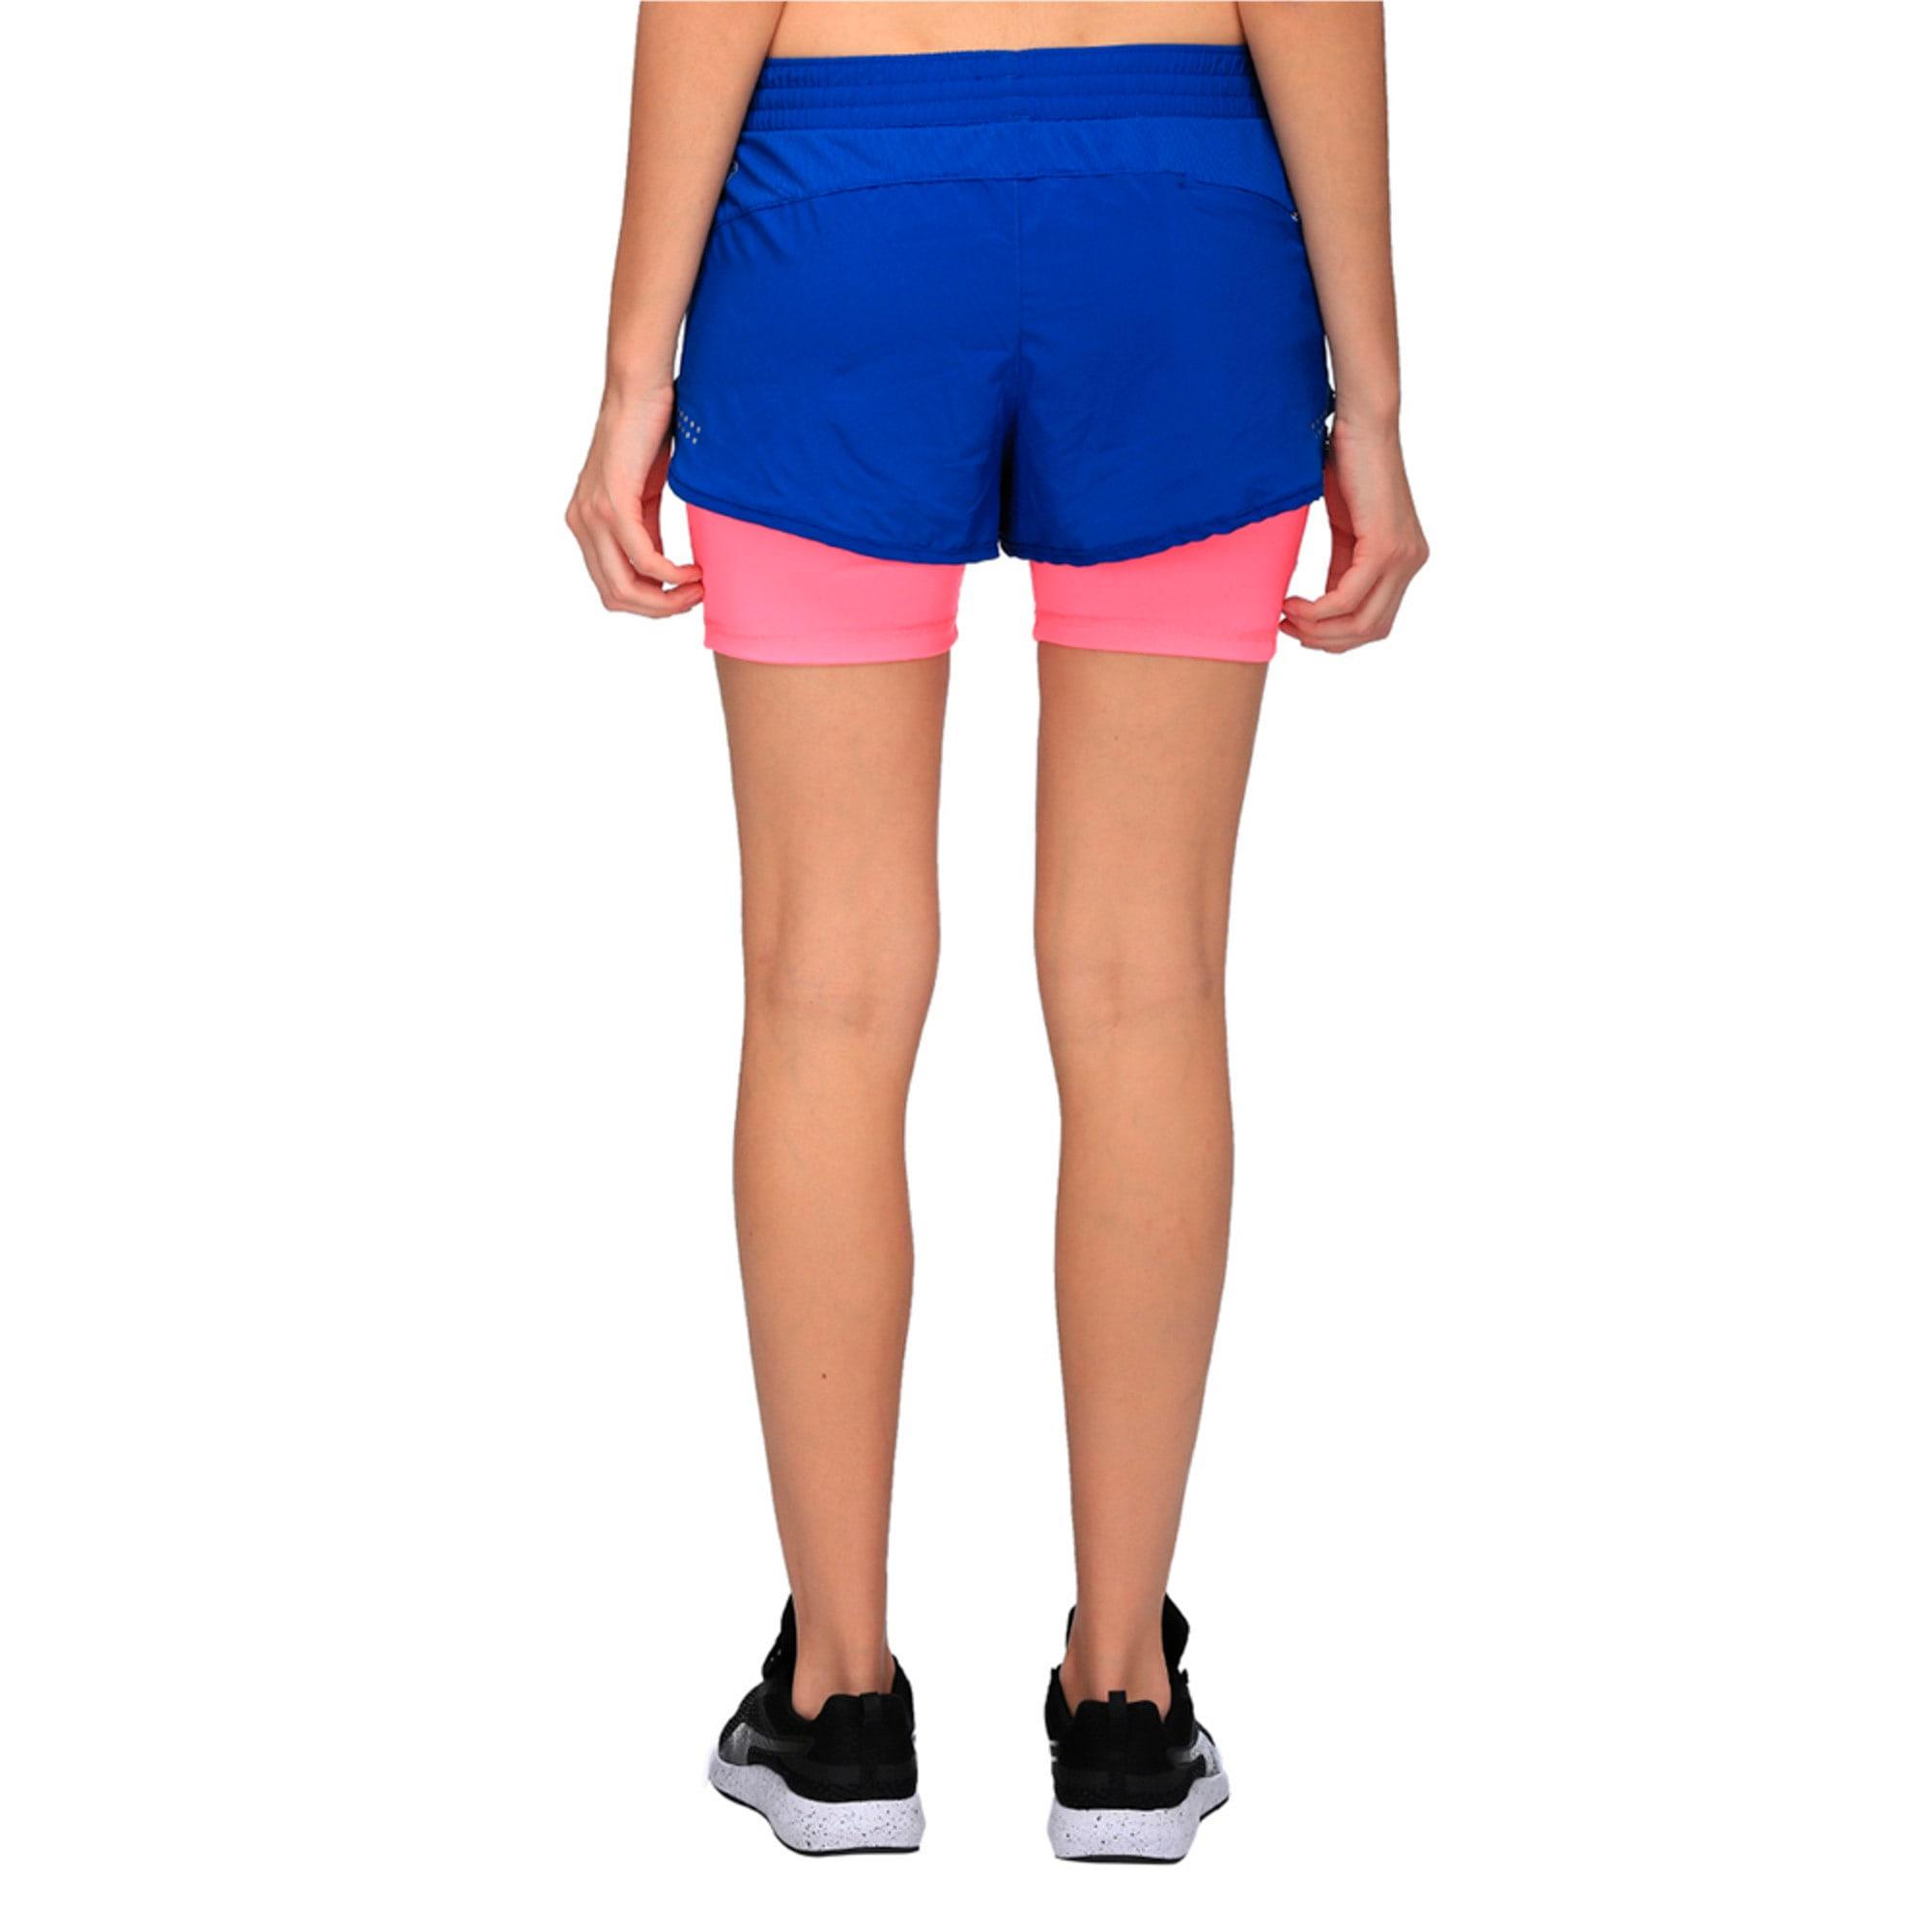 Thumbnail 2 of Running Women's Blast 2 in 1 Shorts, TRUE BLUE-KNOCKOUT PINK, medium-IND